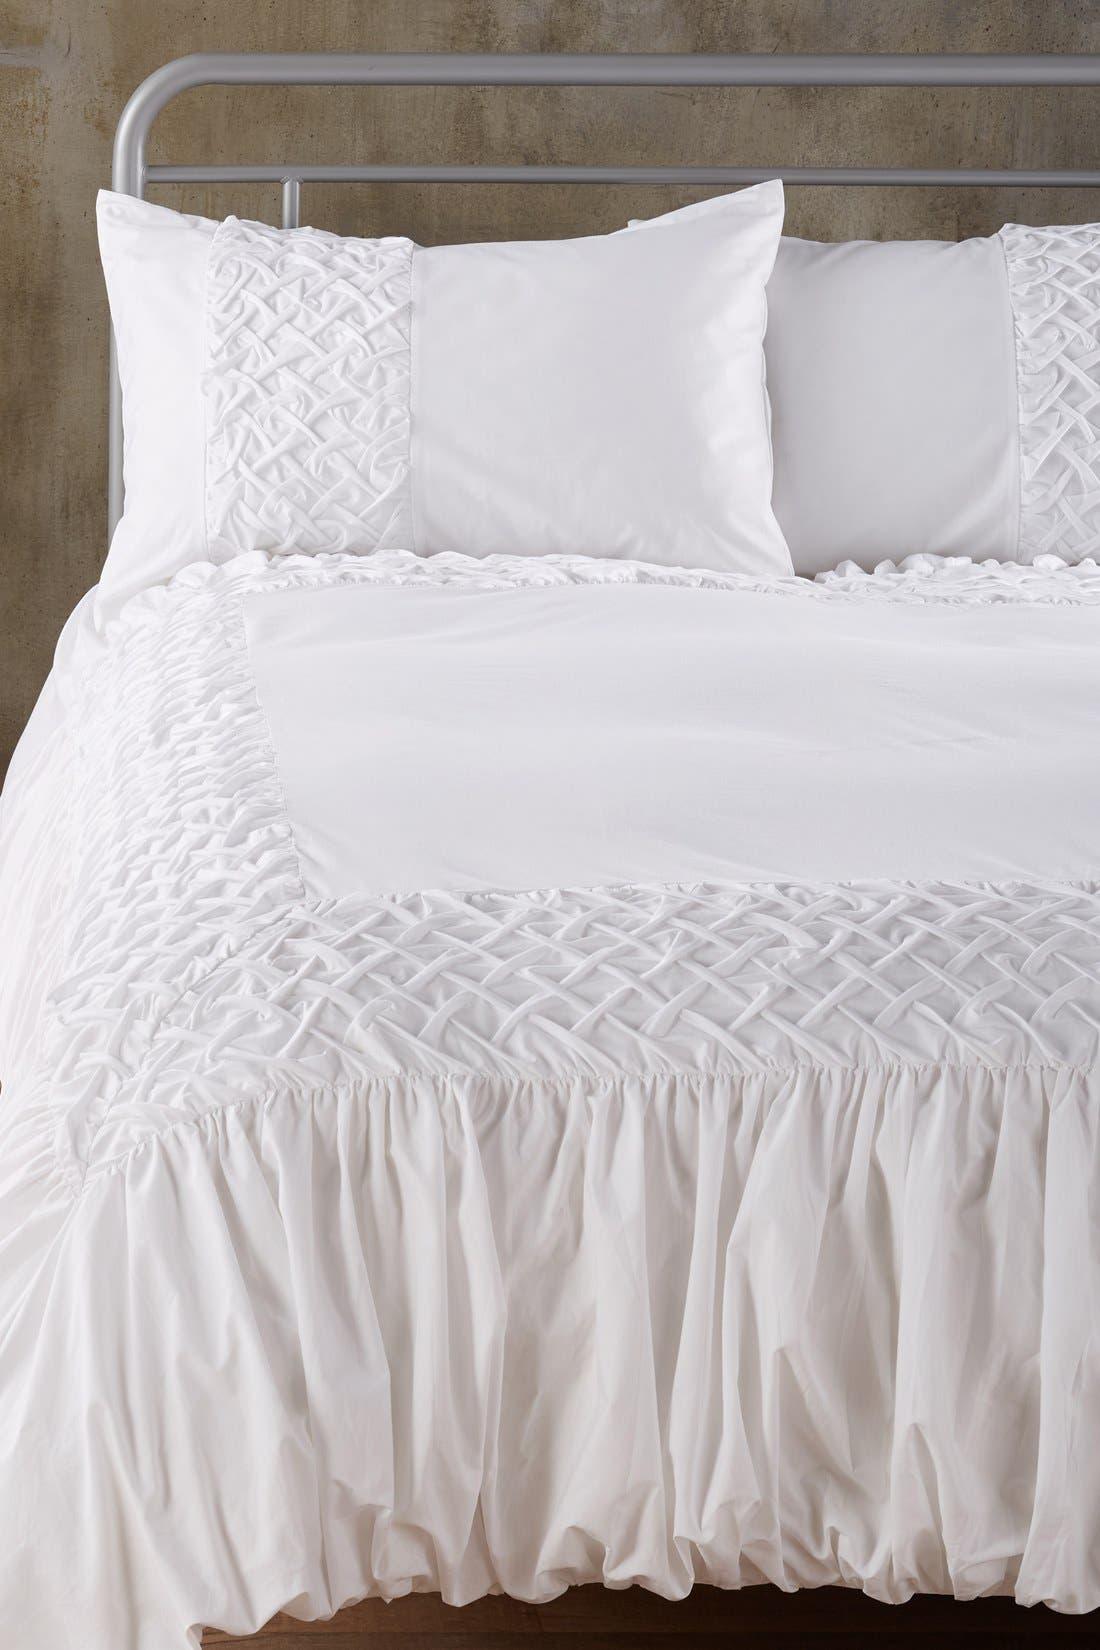 Alternate Image 1 Selected - Nordstrom at Home 'Cady' Smocked Weave Duvet Cover